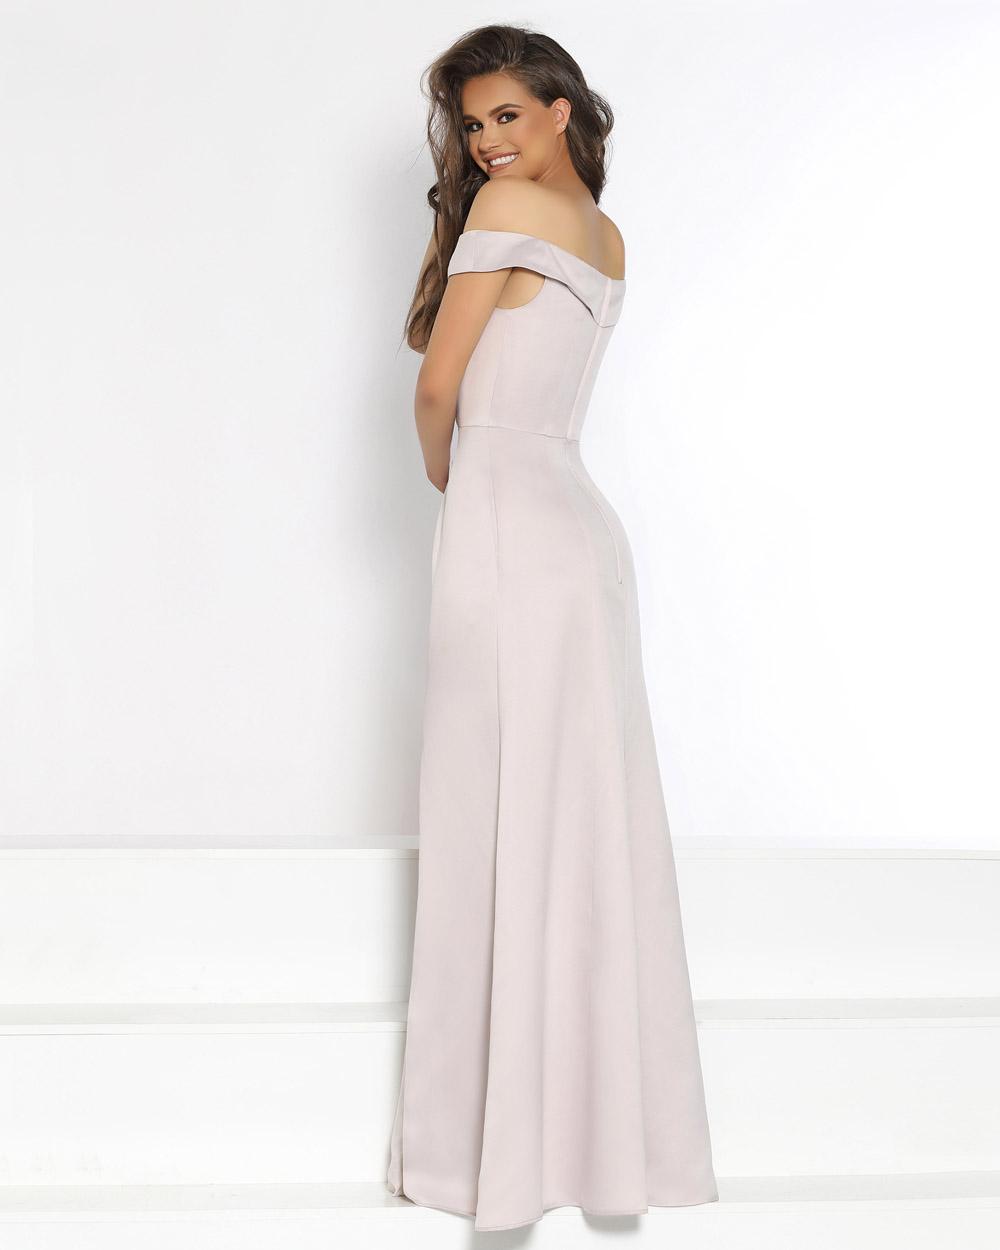 Kanali K 1699 - 2019 Bridesmaid Dress